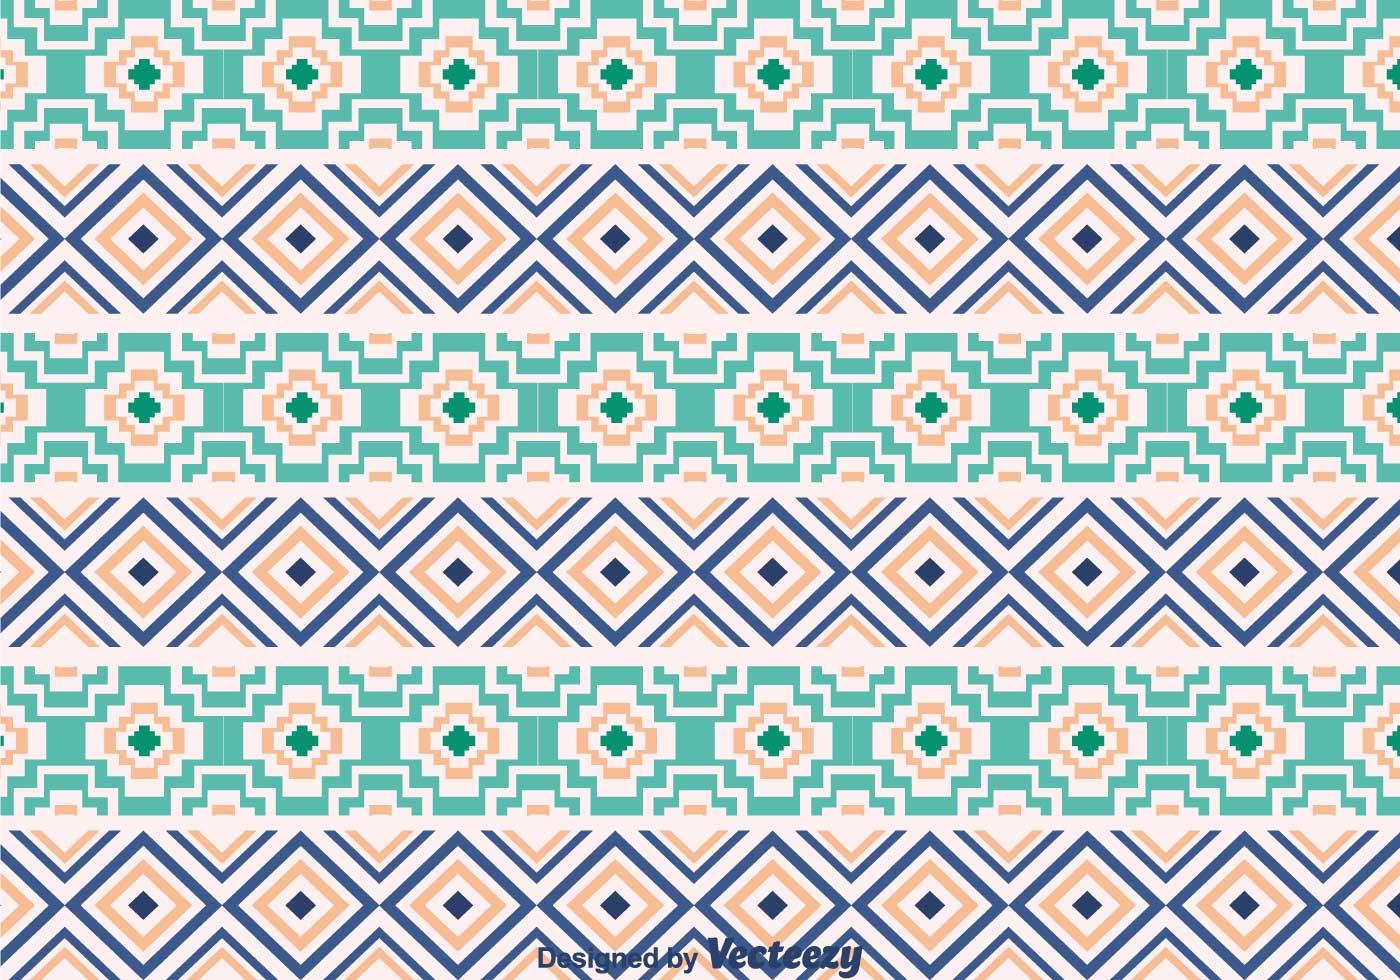 Ethnic Aztec Ornament Pattern - Download Free Vector Art